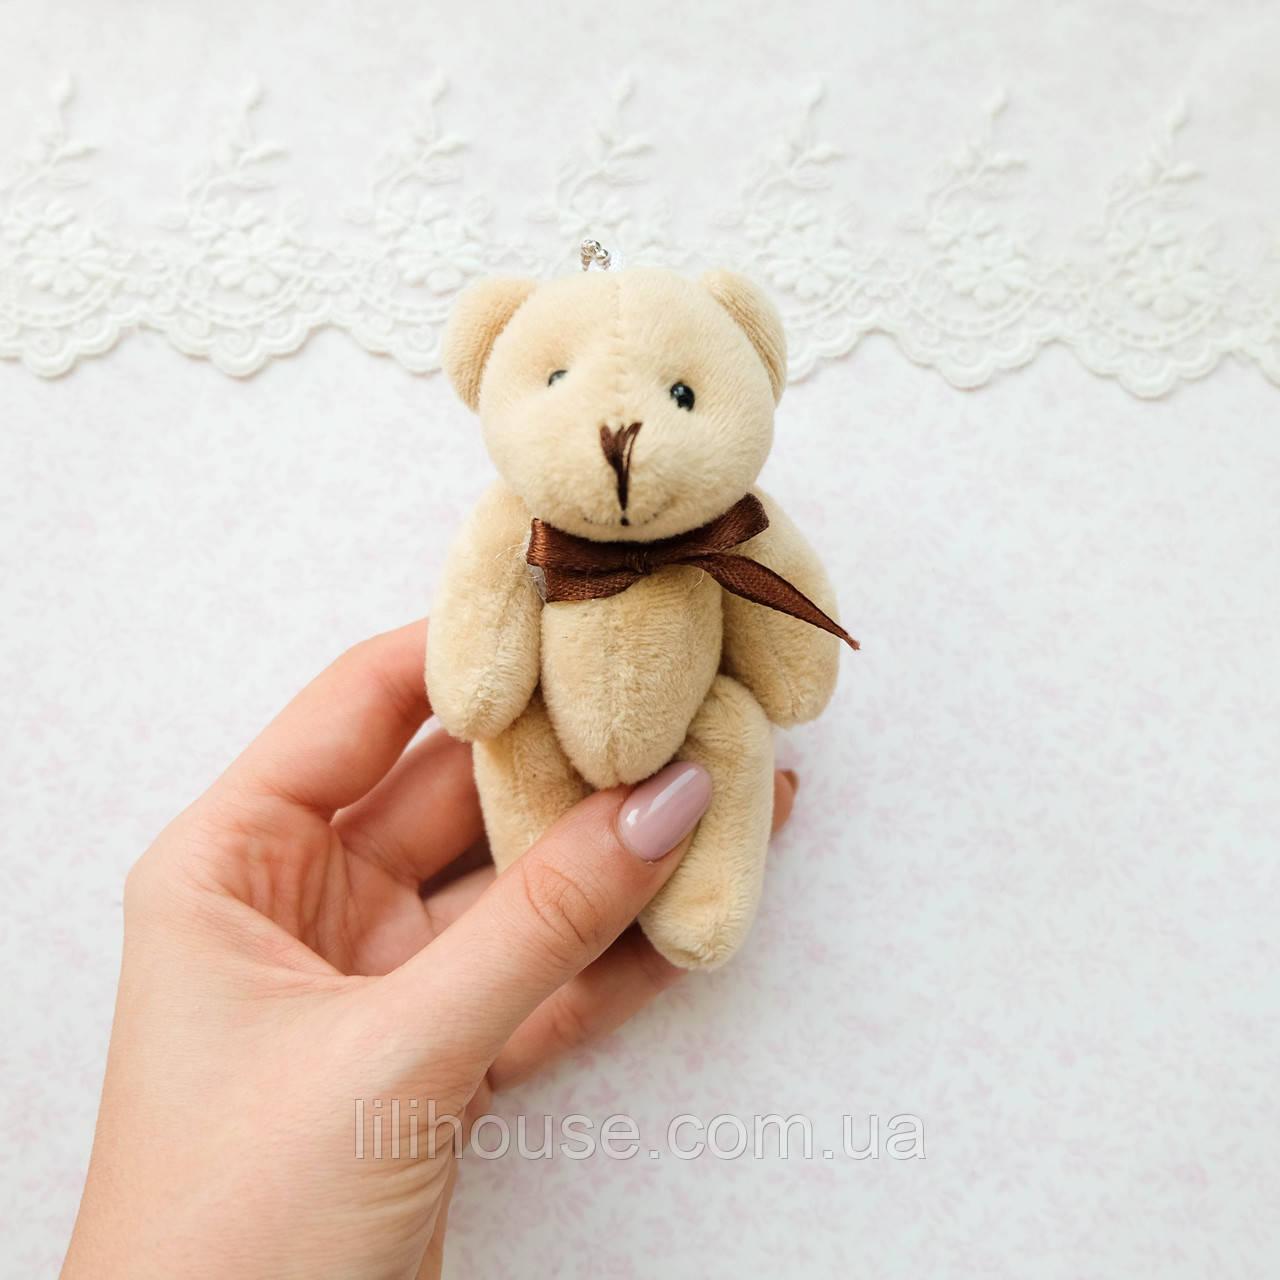 Латте медведь мягкий брелок-миниатюра, 11 см